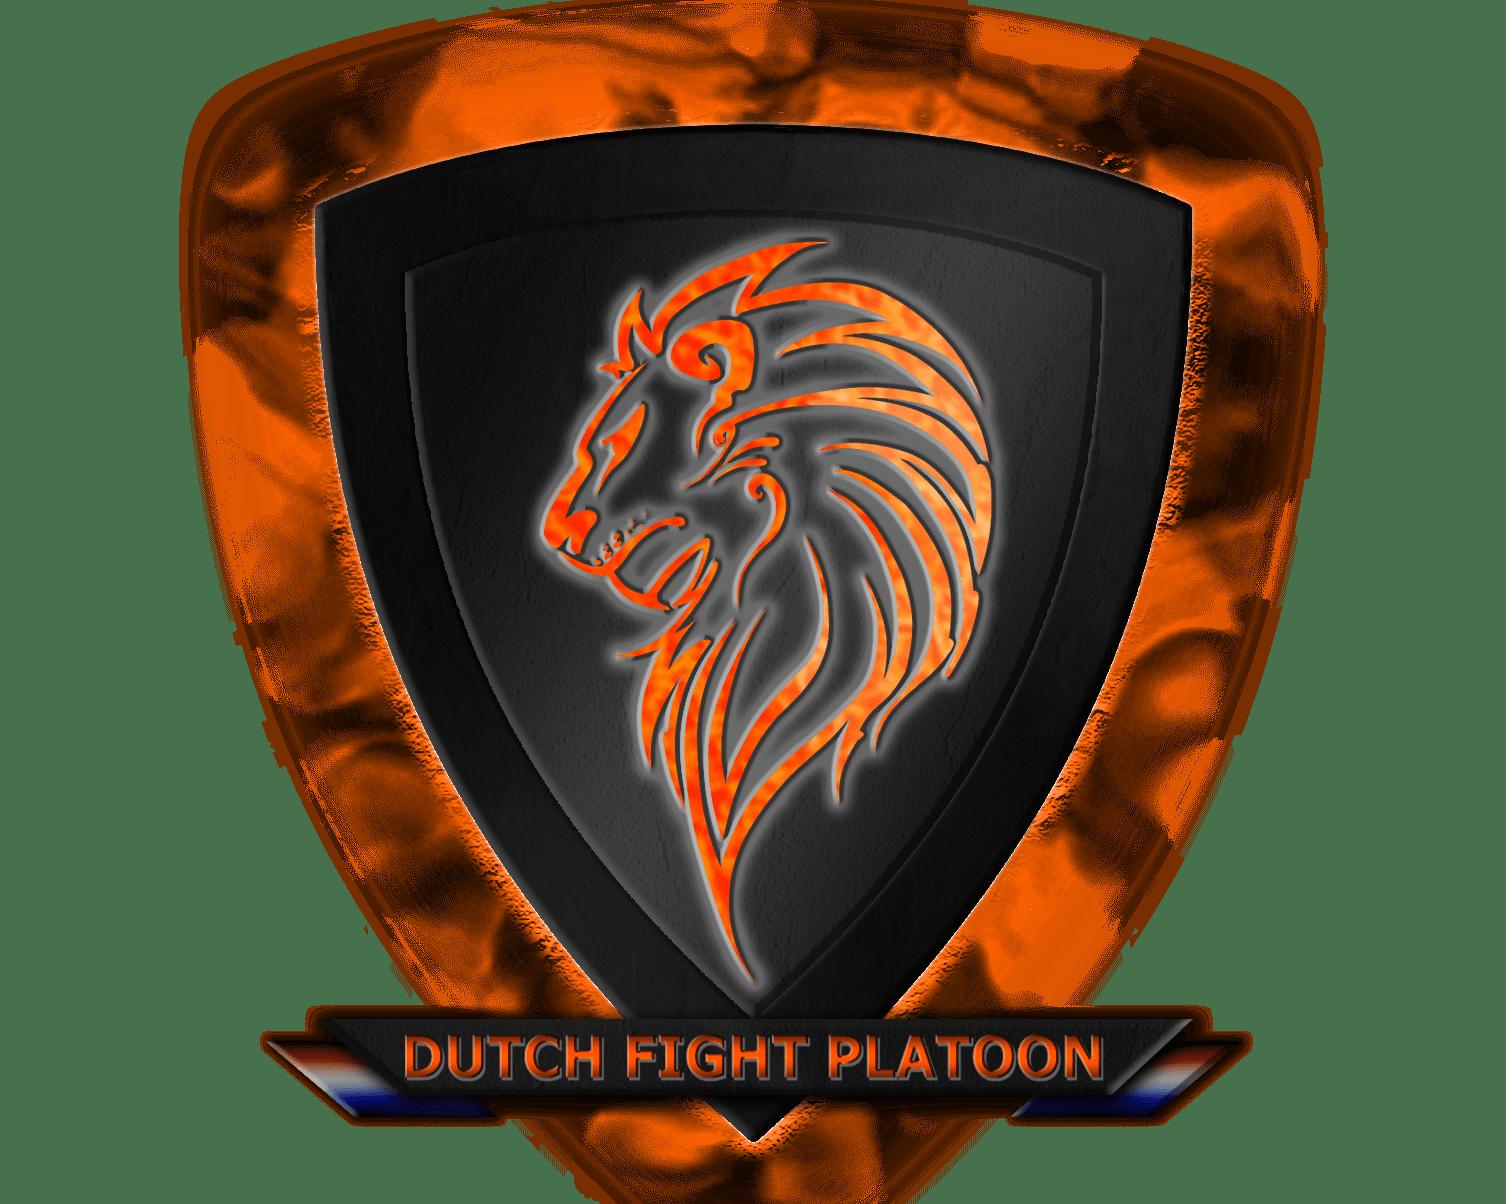 Dutch Fight Platoon